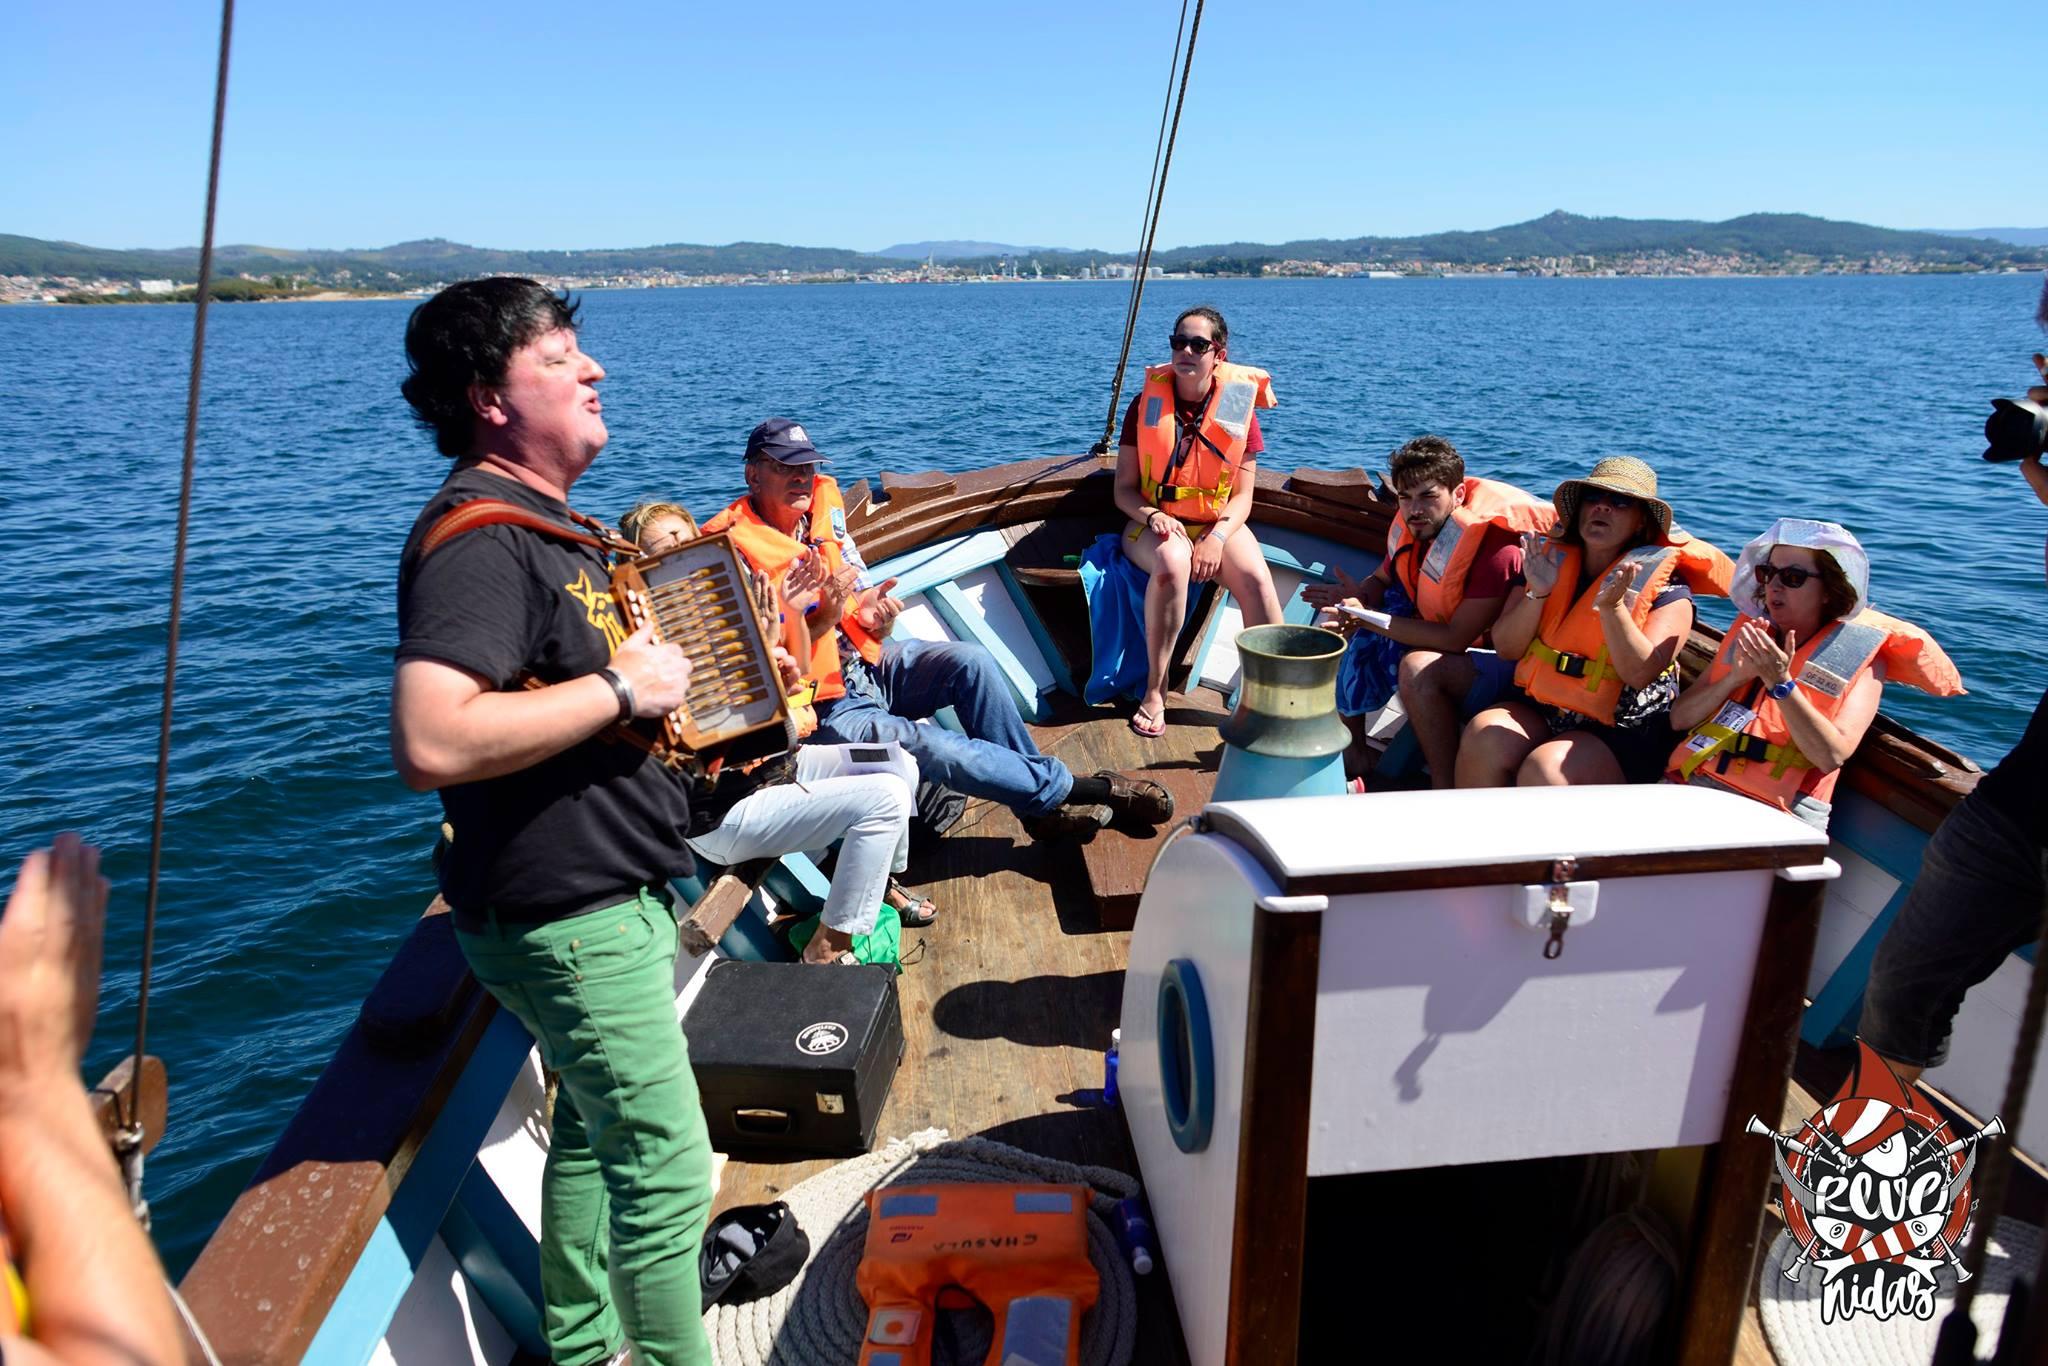 Eventos en Galicia: Revenidas 2017